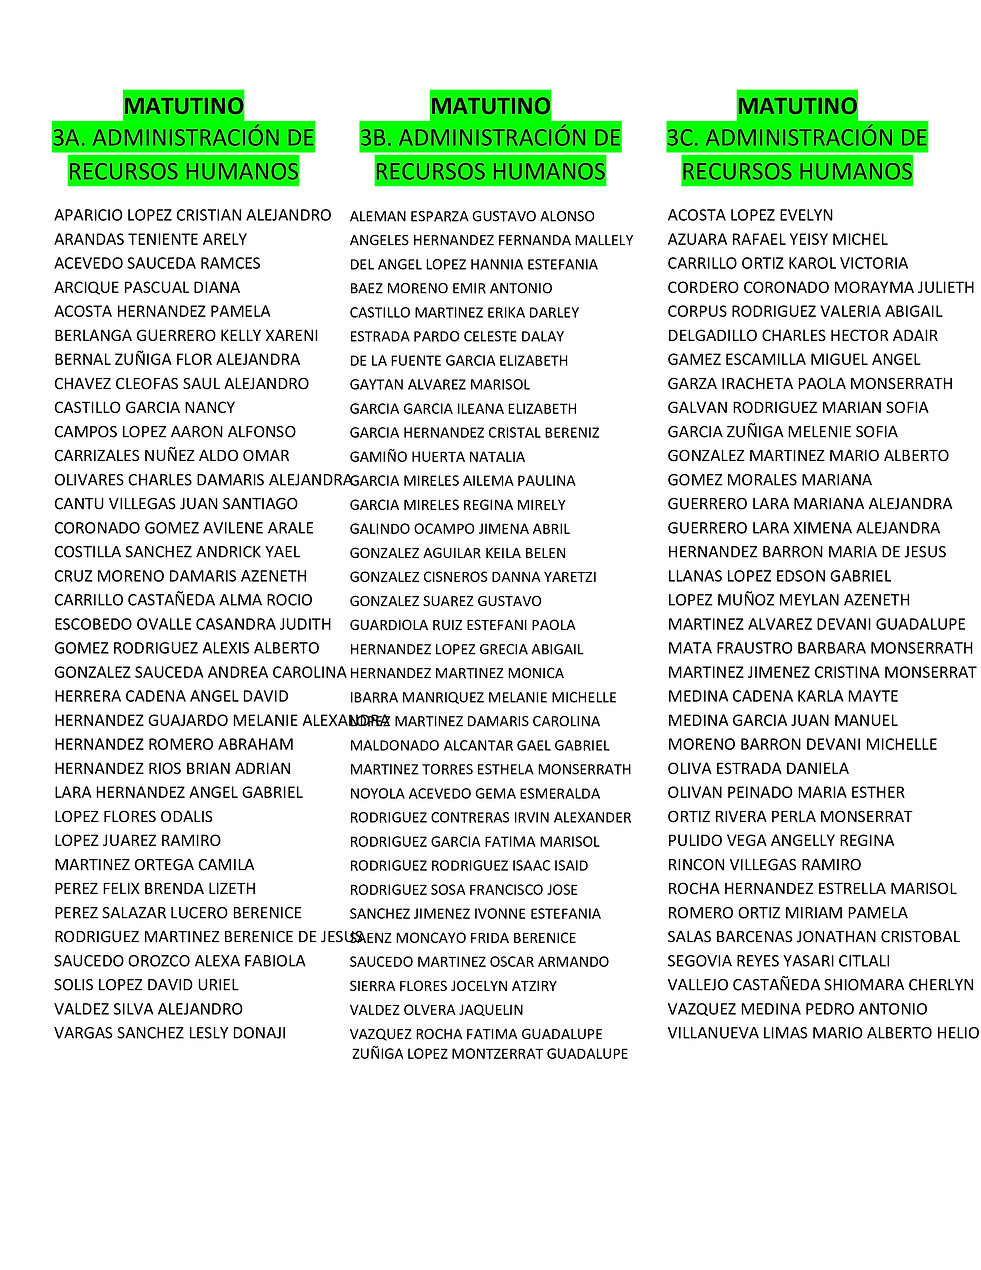 LISTAS PARA PUBLICAR 3ero. MATUTINO (1)-0.jpg